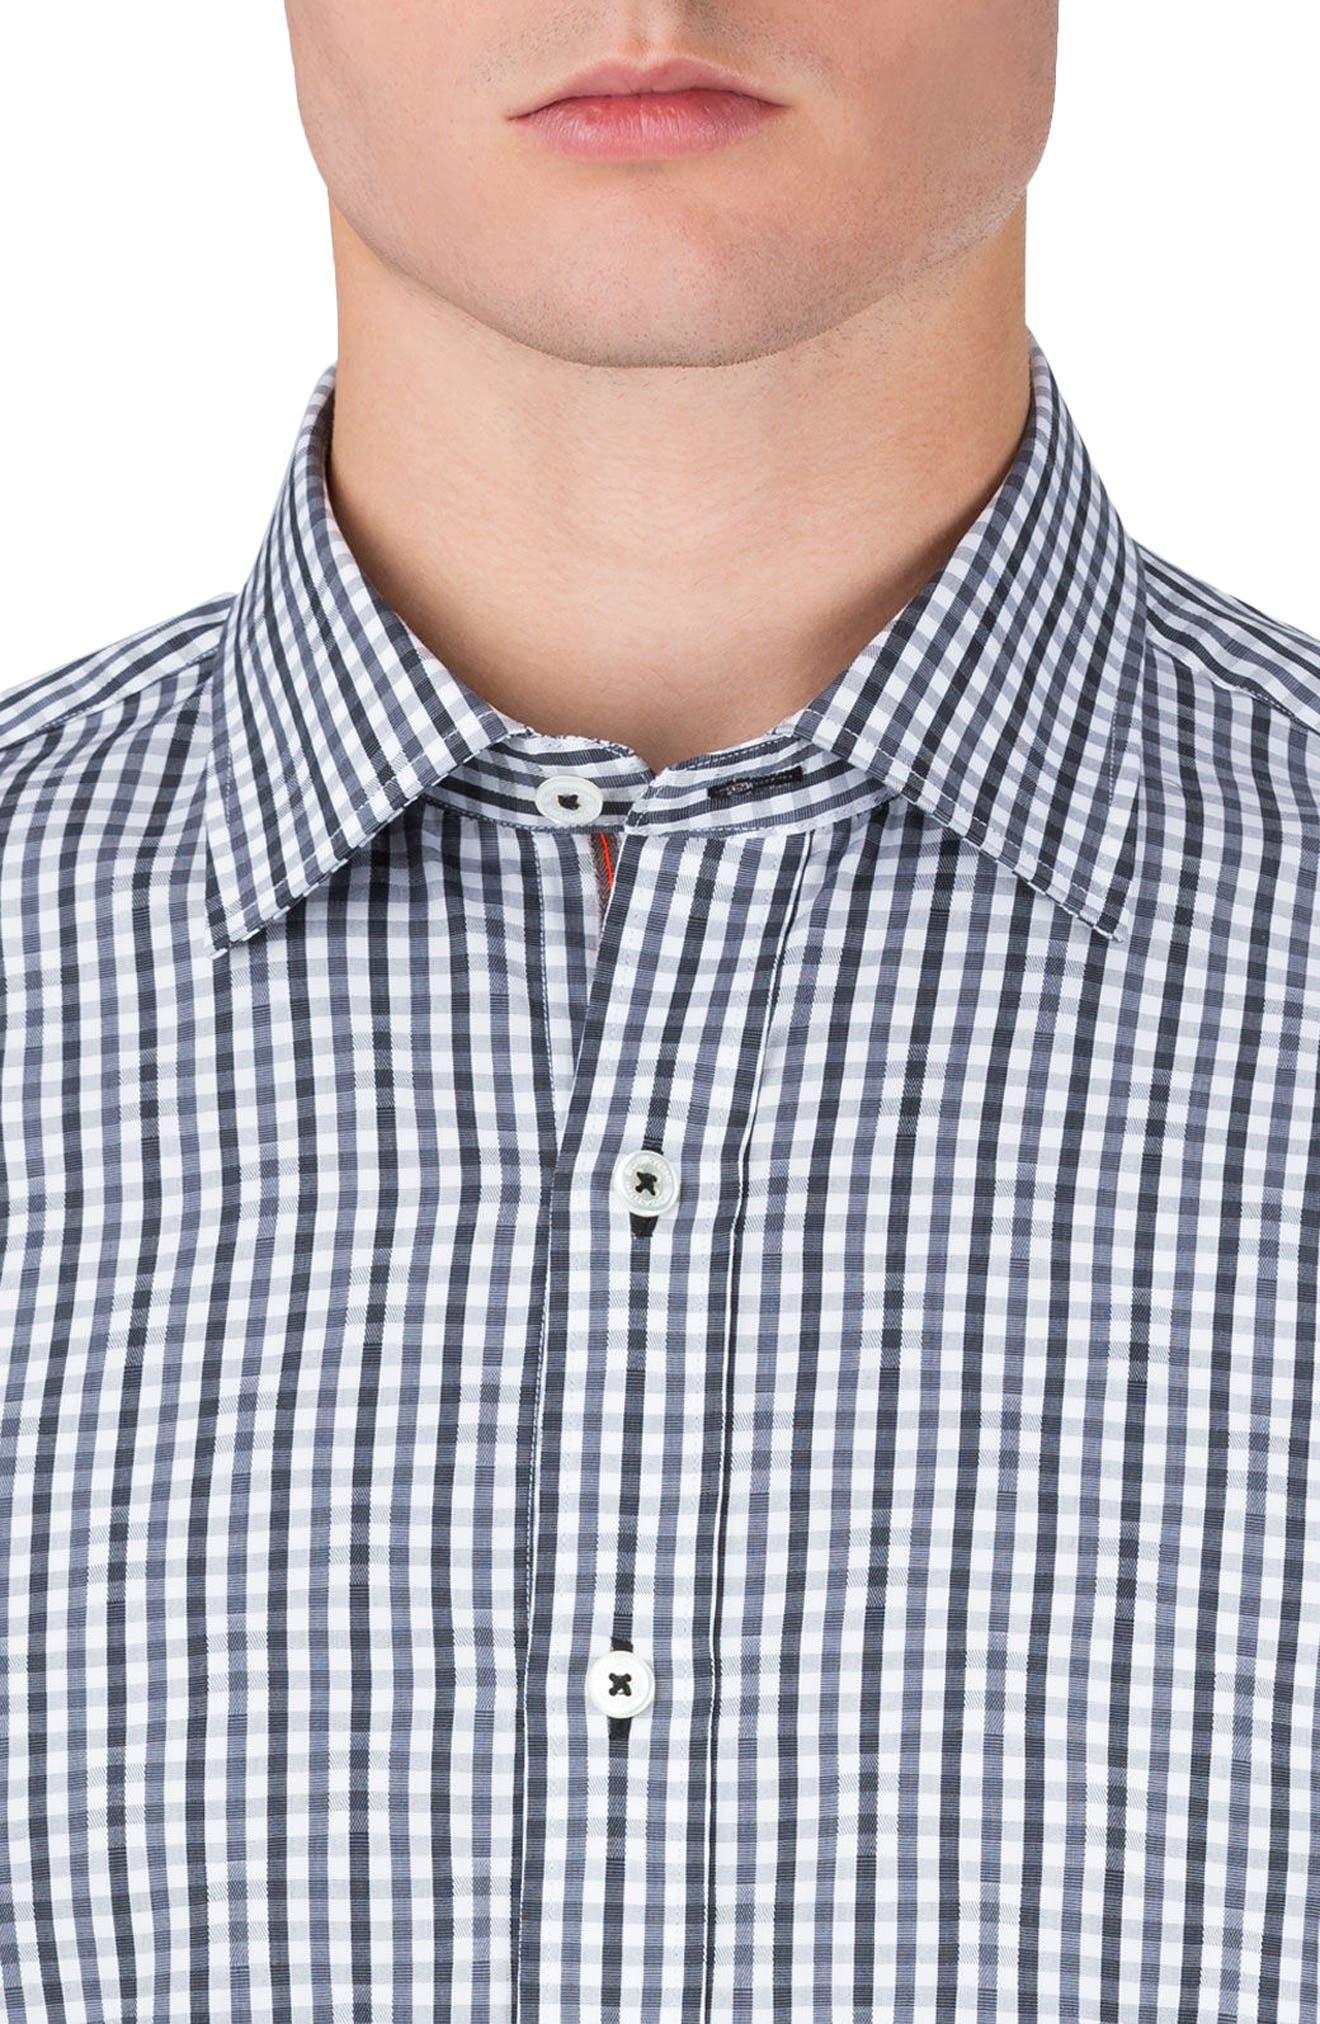 Classic Fit Gingham Sport Shirt,                             Alternate thumbnail 3, color,                             Graphite